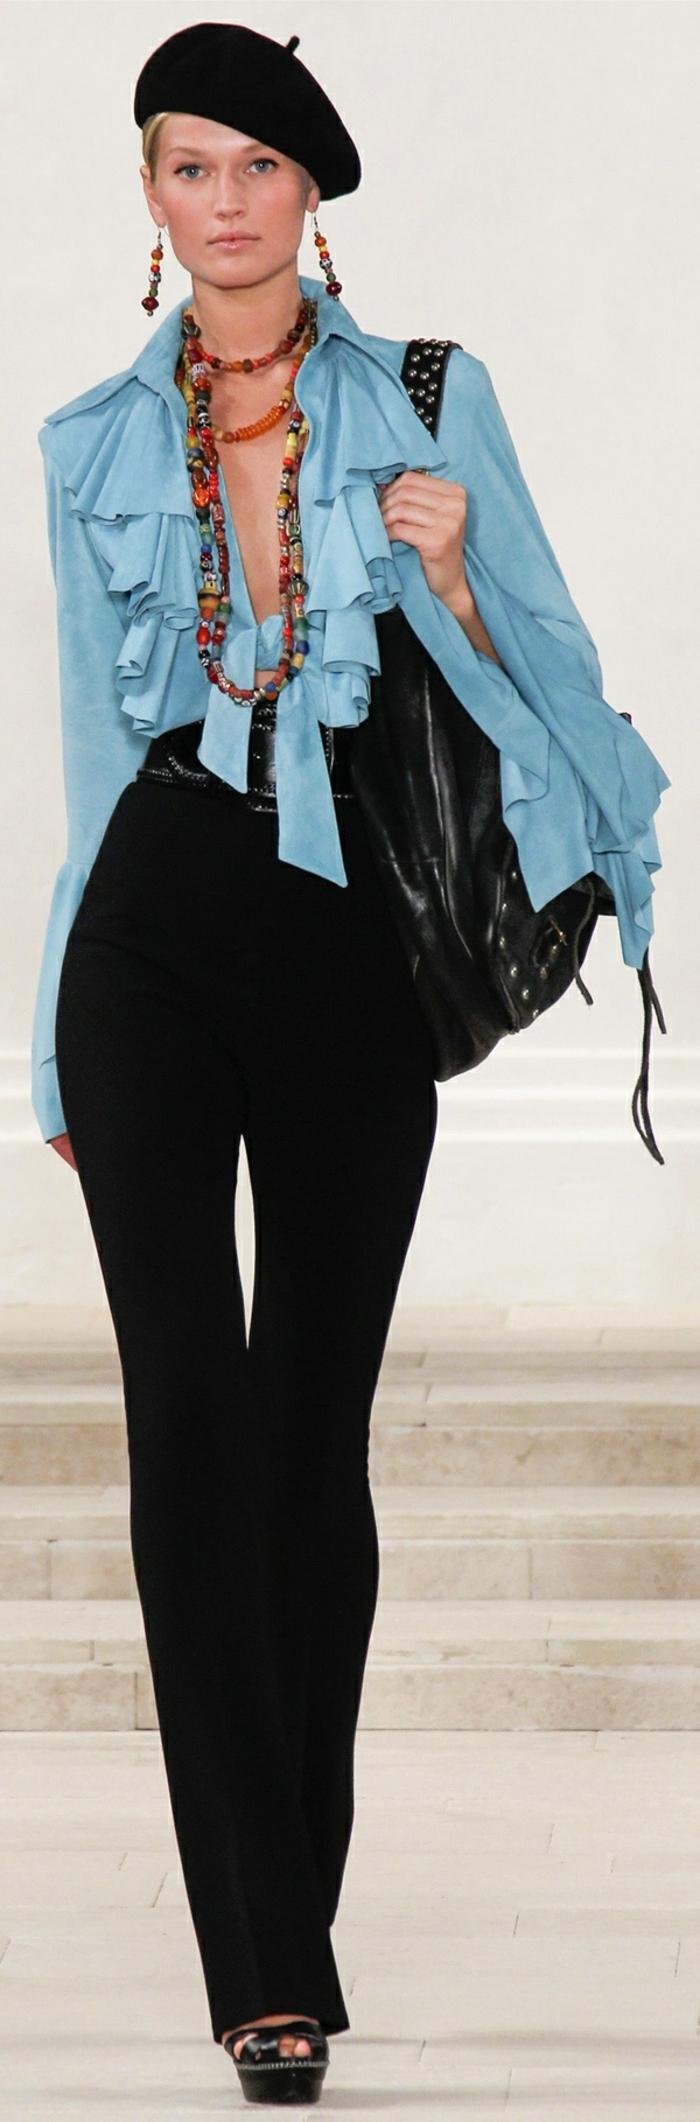 Ralph-Lauren-Kollektion-2013-Barett-Mütze-schwarz-klassisches-Modell-Schmuck-blaues-Hemd-schwarze-Hosen-Ledertasche